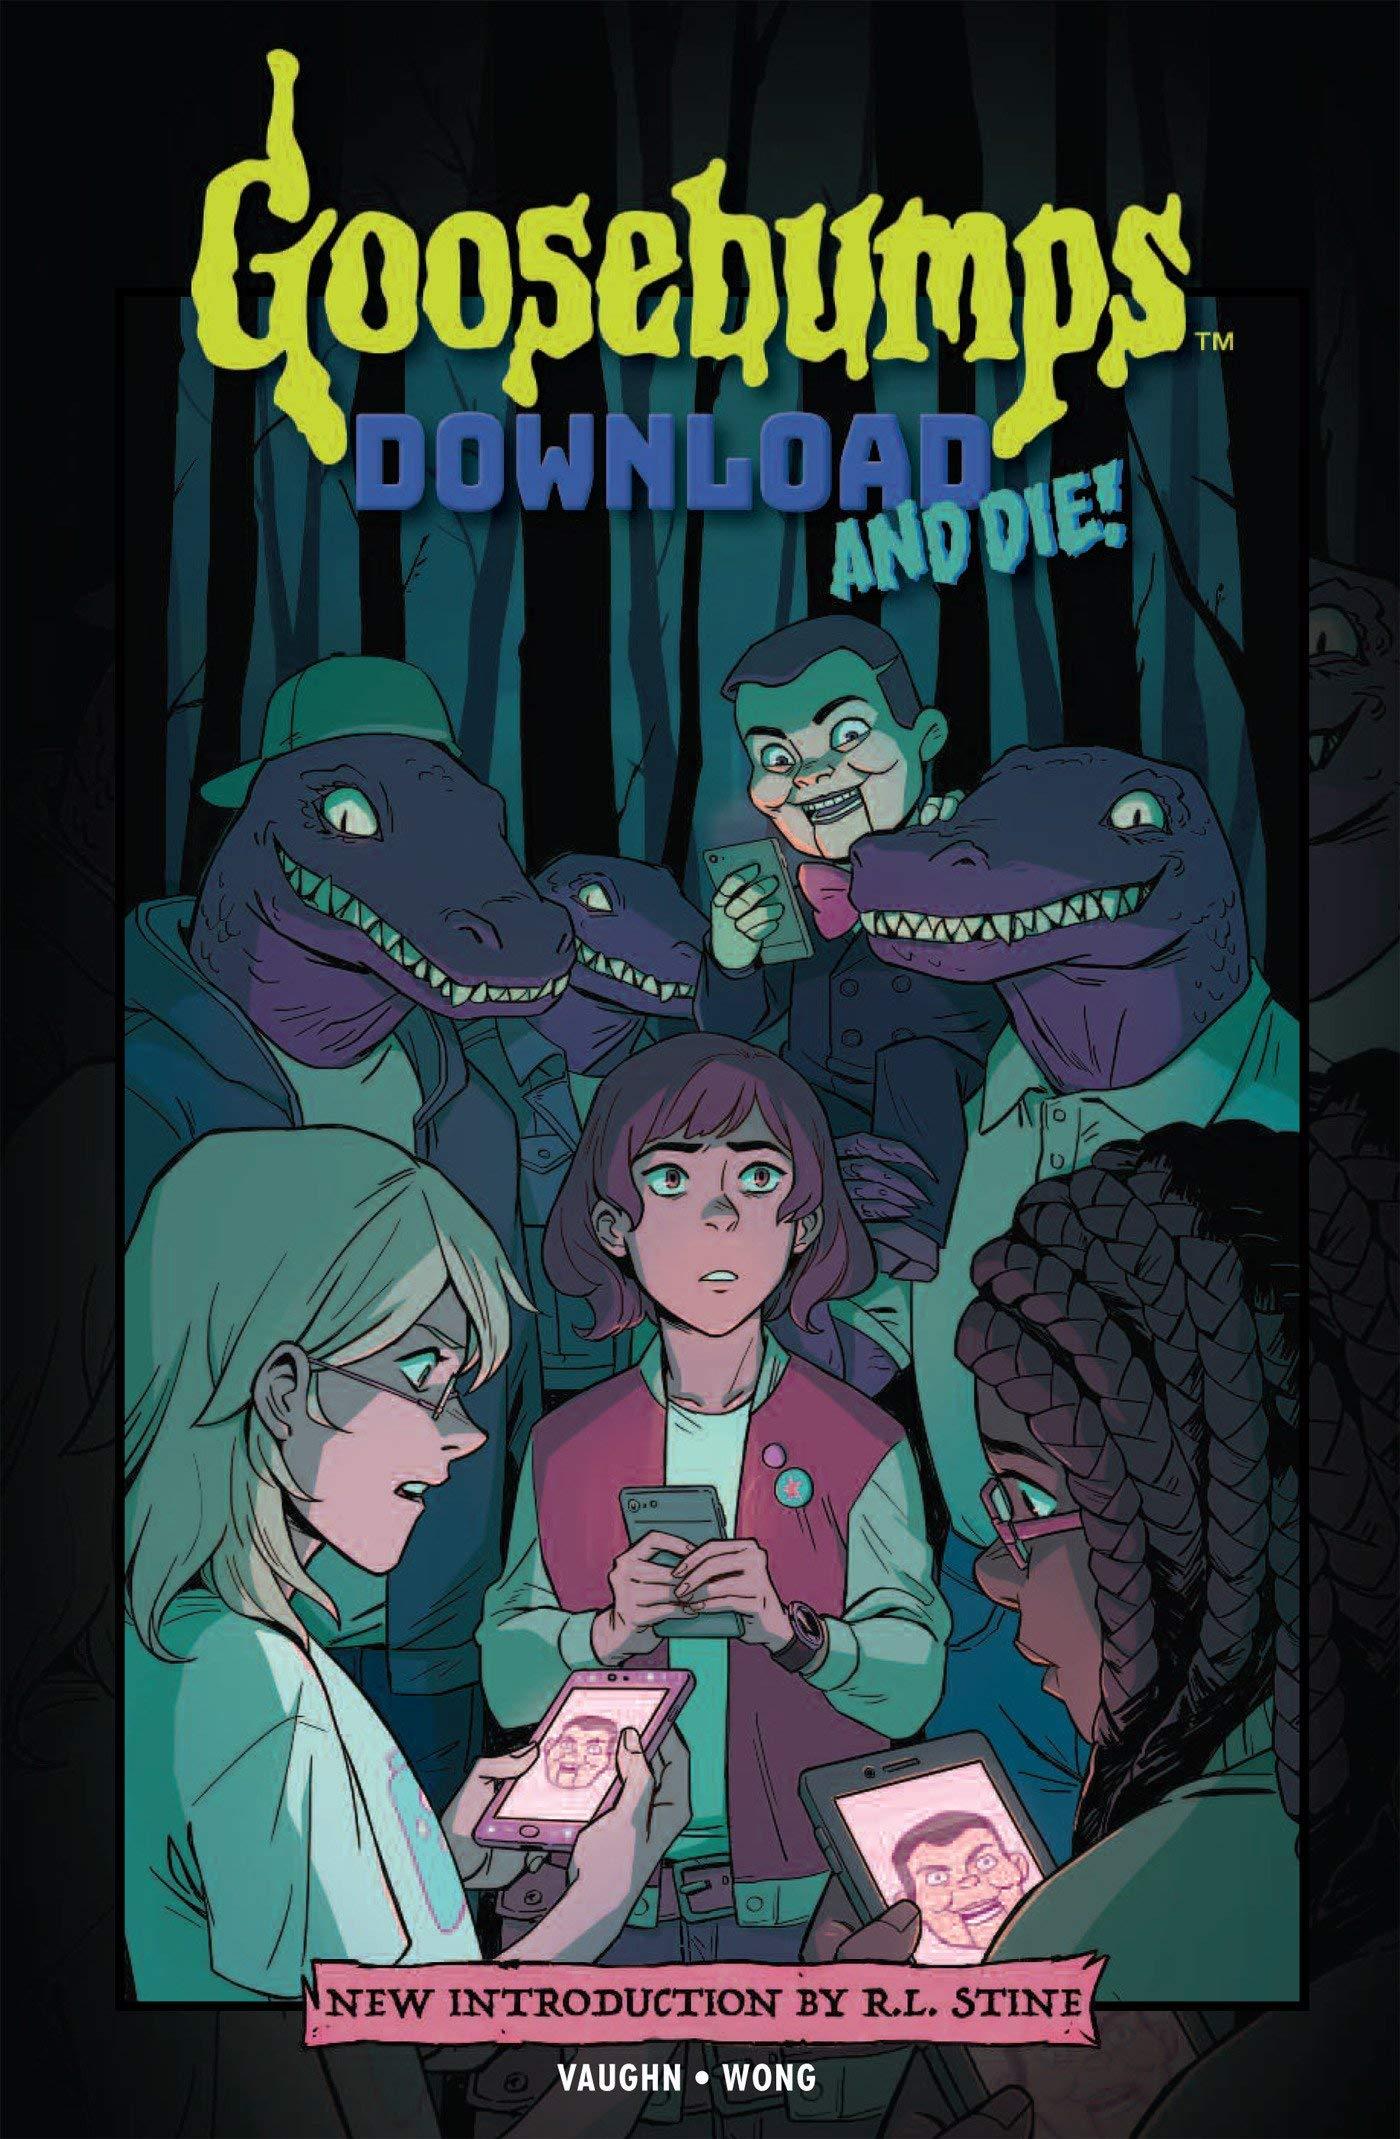 Goosebumps: Download and Die! pdf epub